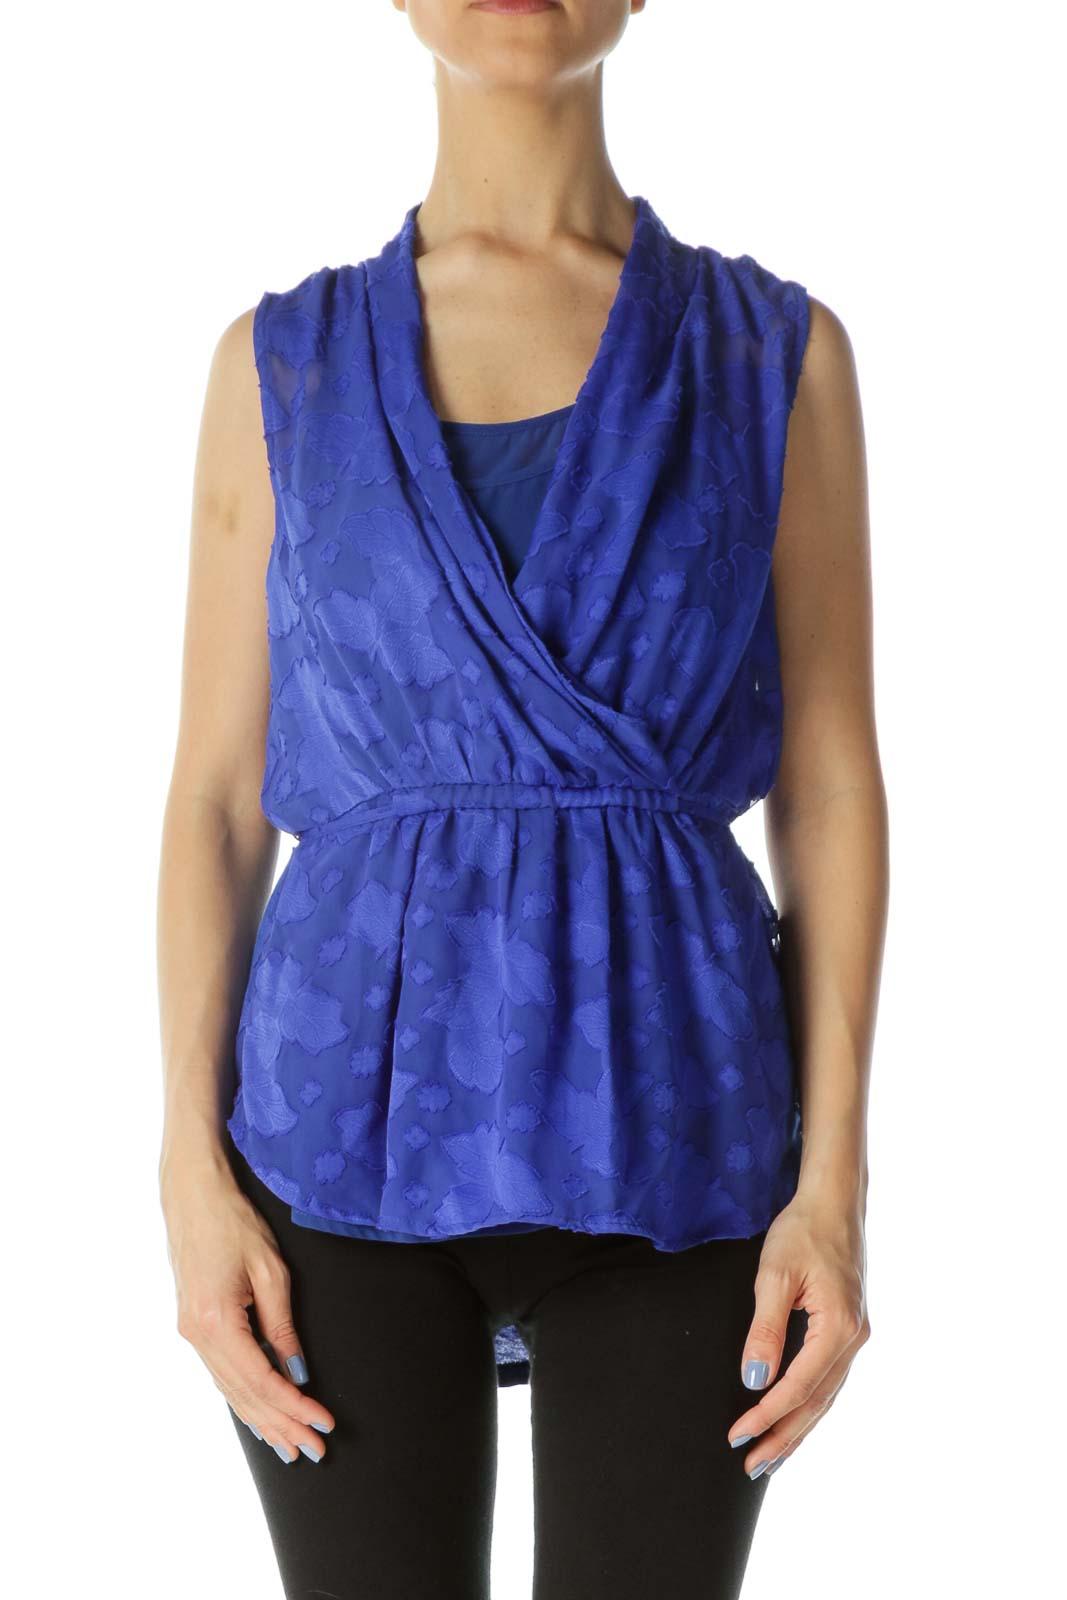 Royal-Blue Textured-Leaves Mixed-Media Sleeveless Top